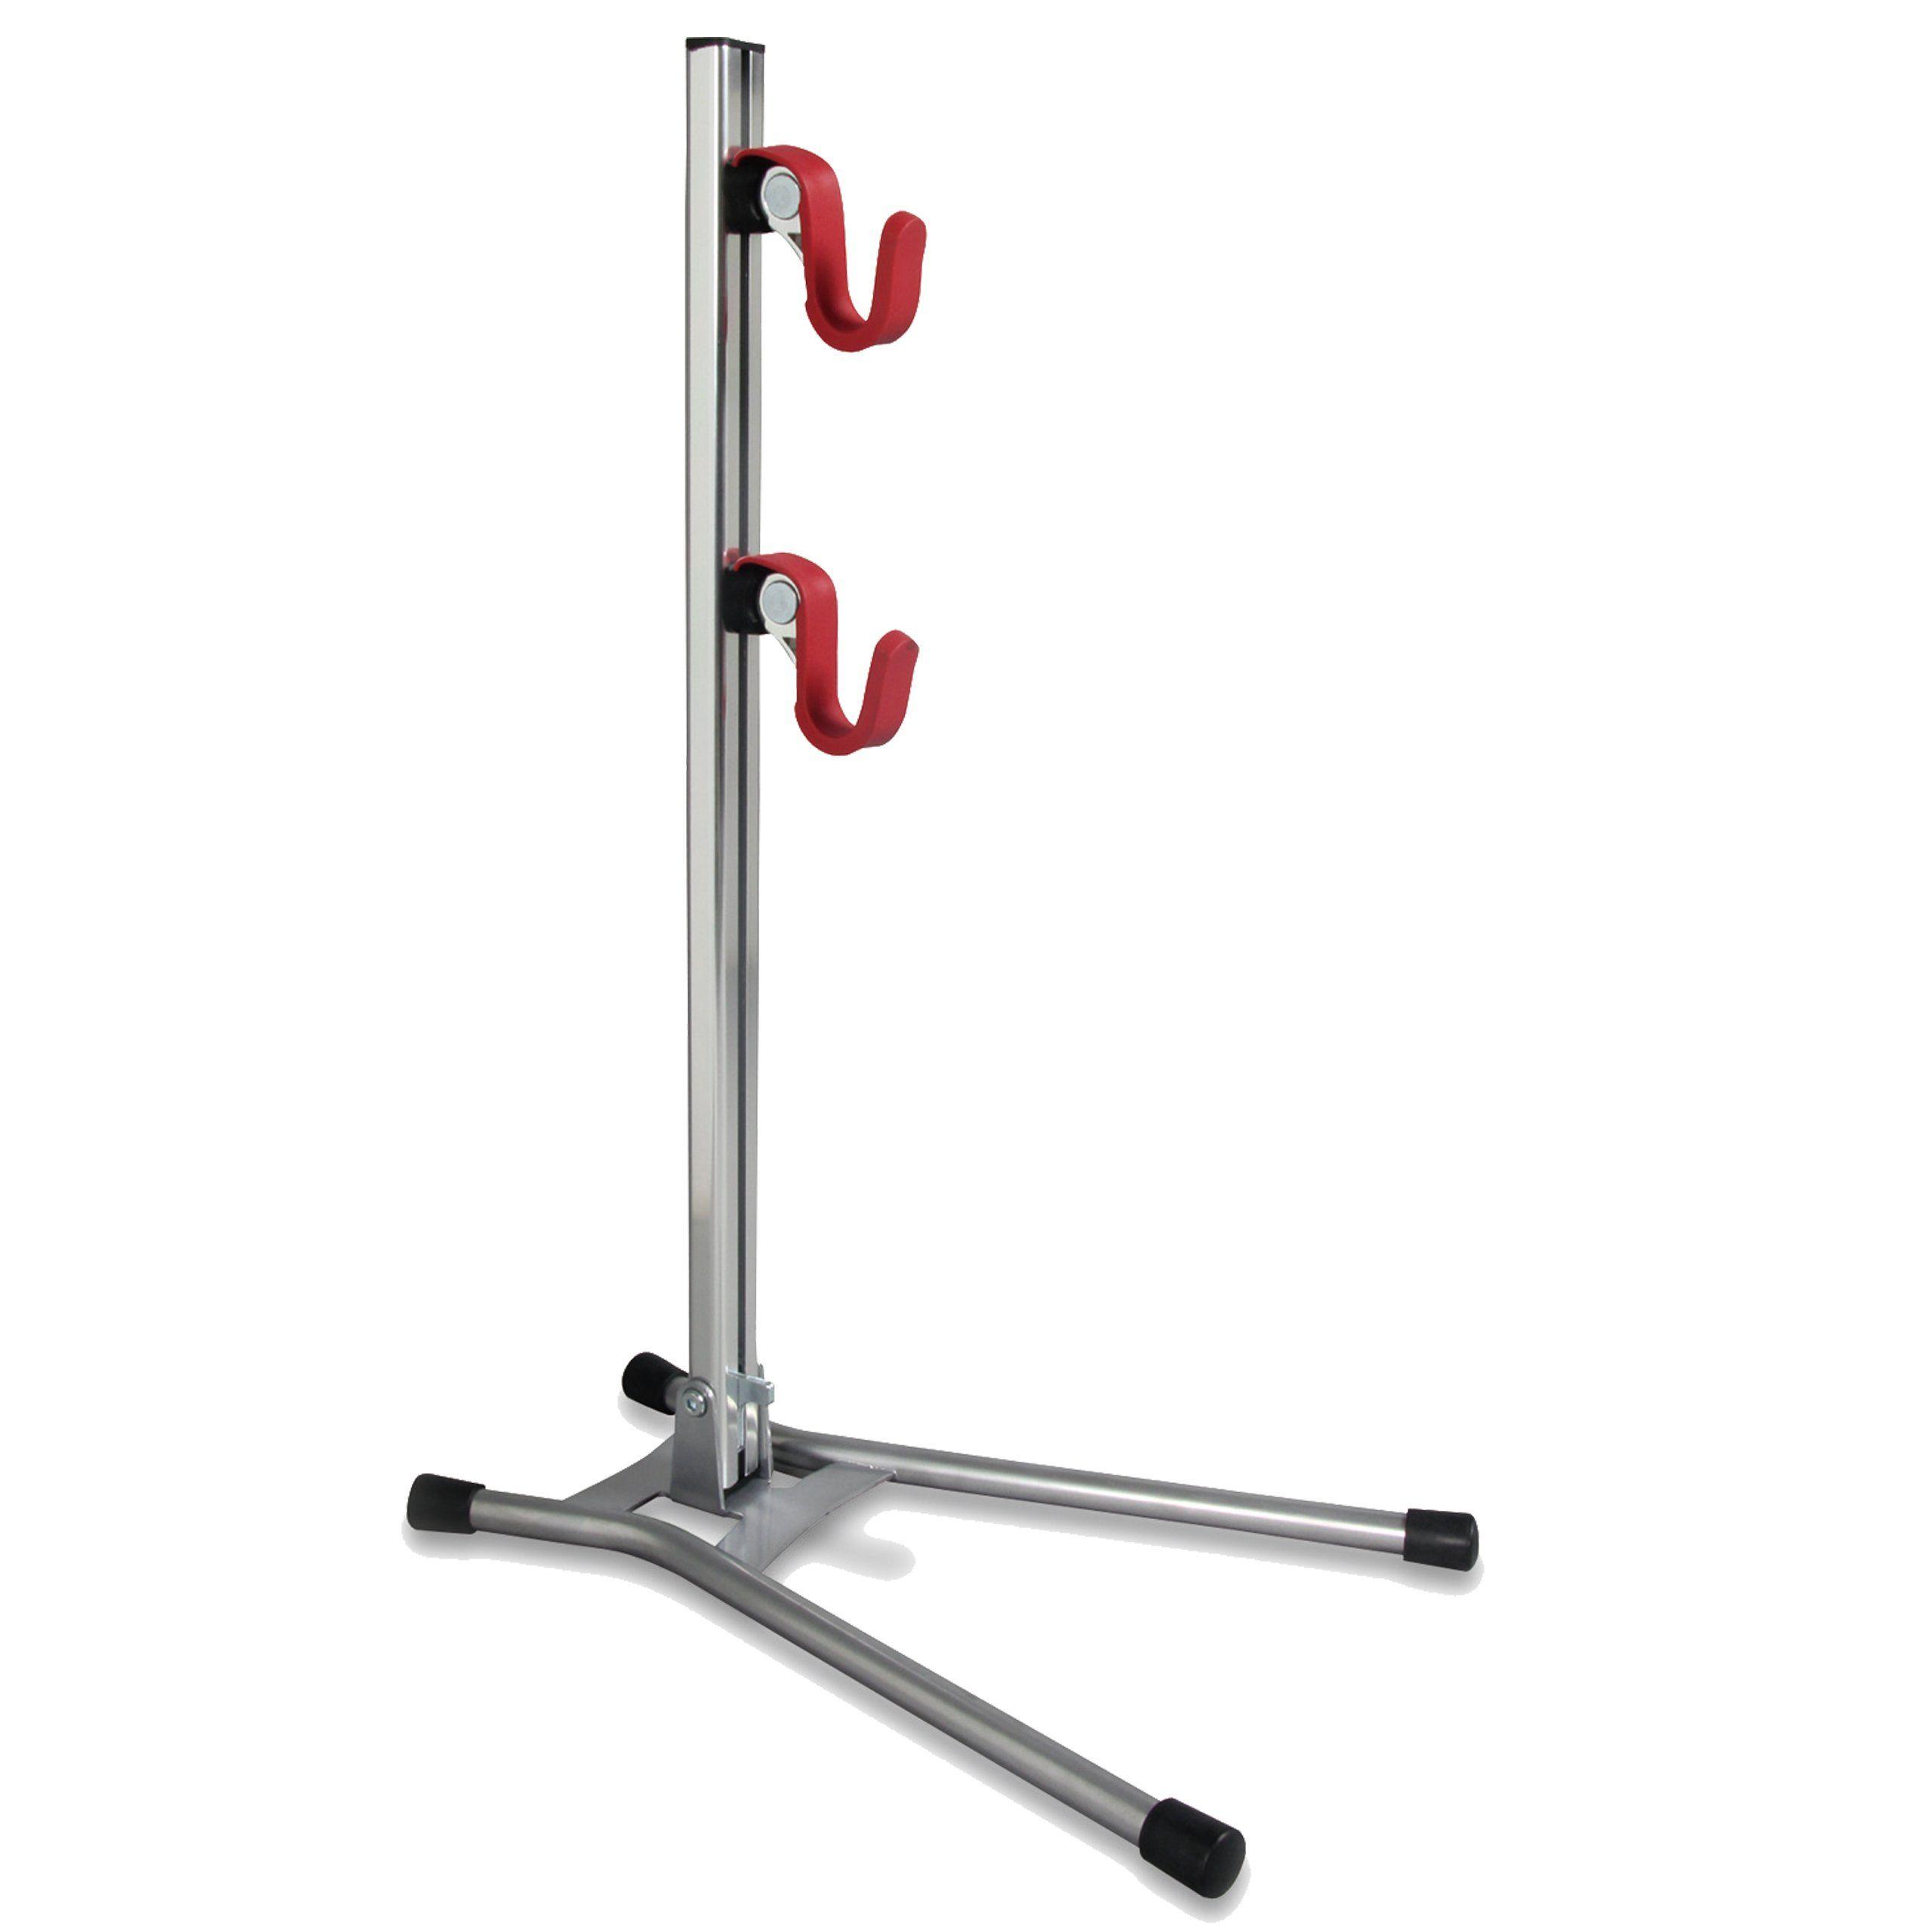 Minoura Display Stand, Silver/Red Indoor bike storage